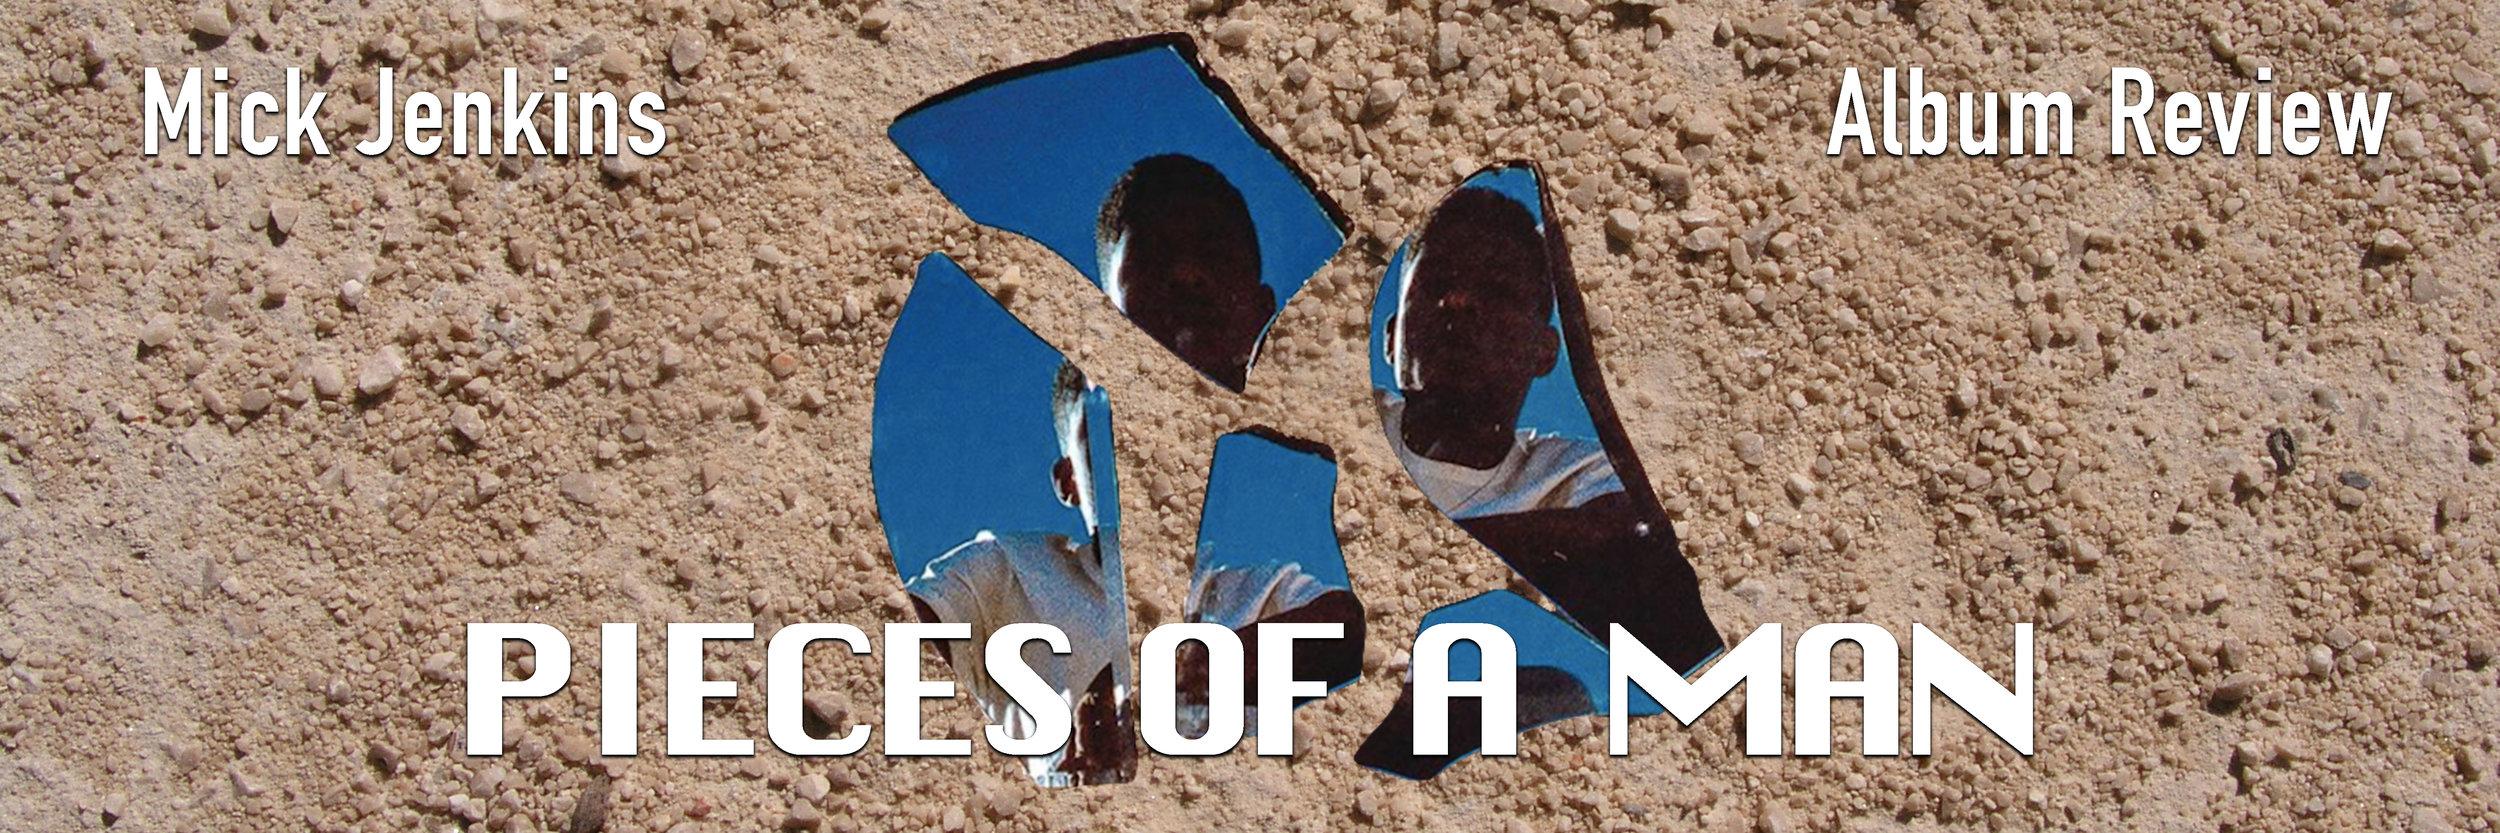 Pieces of a Man.jpg